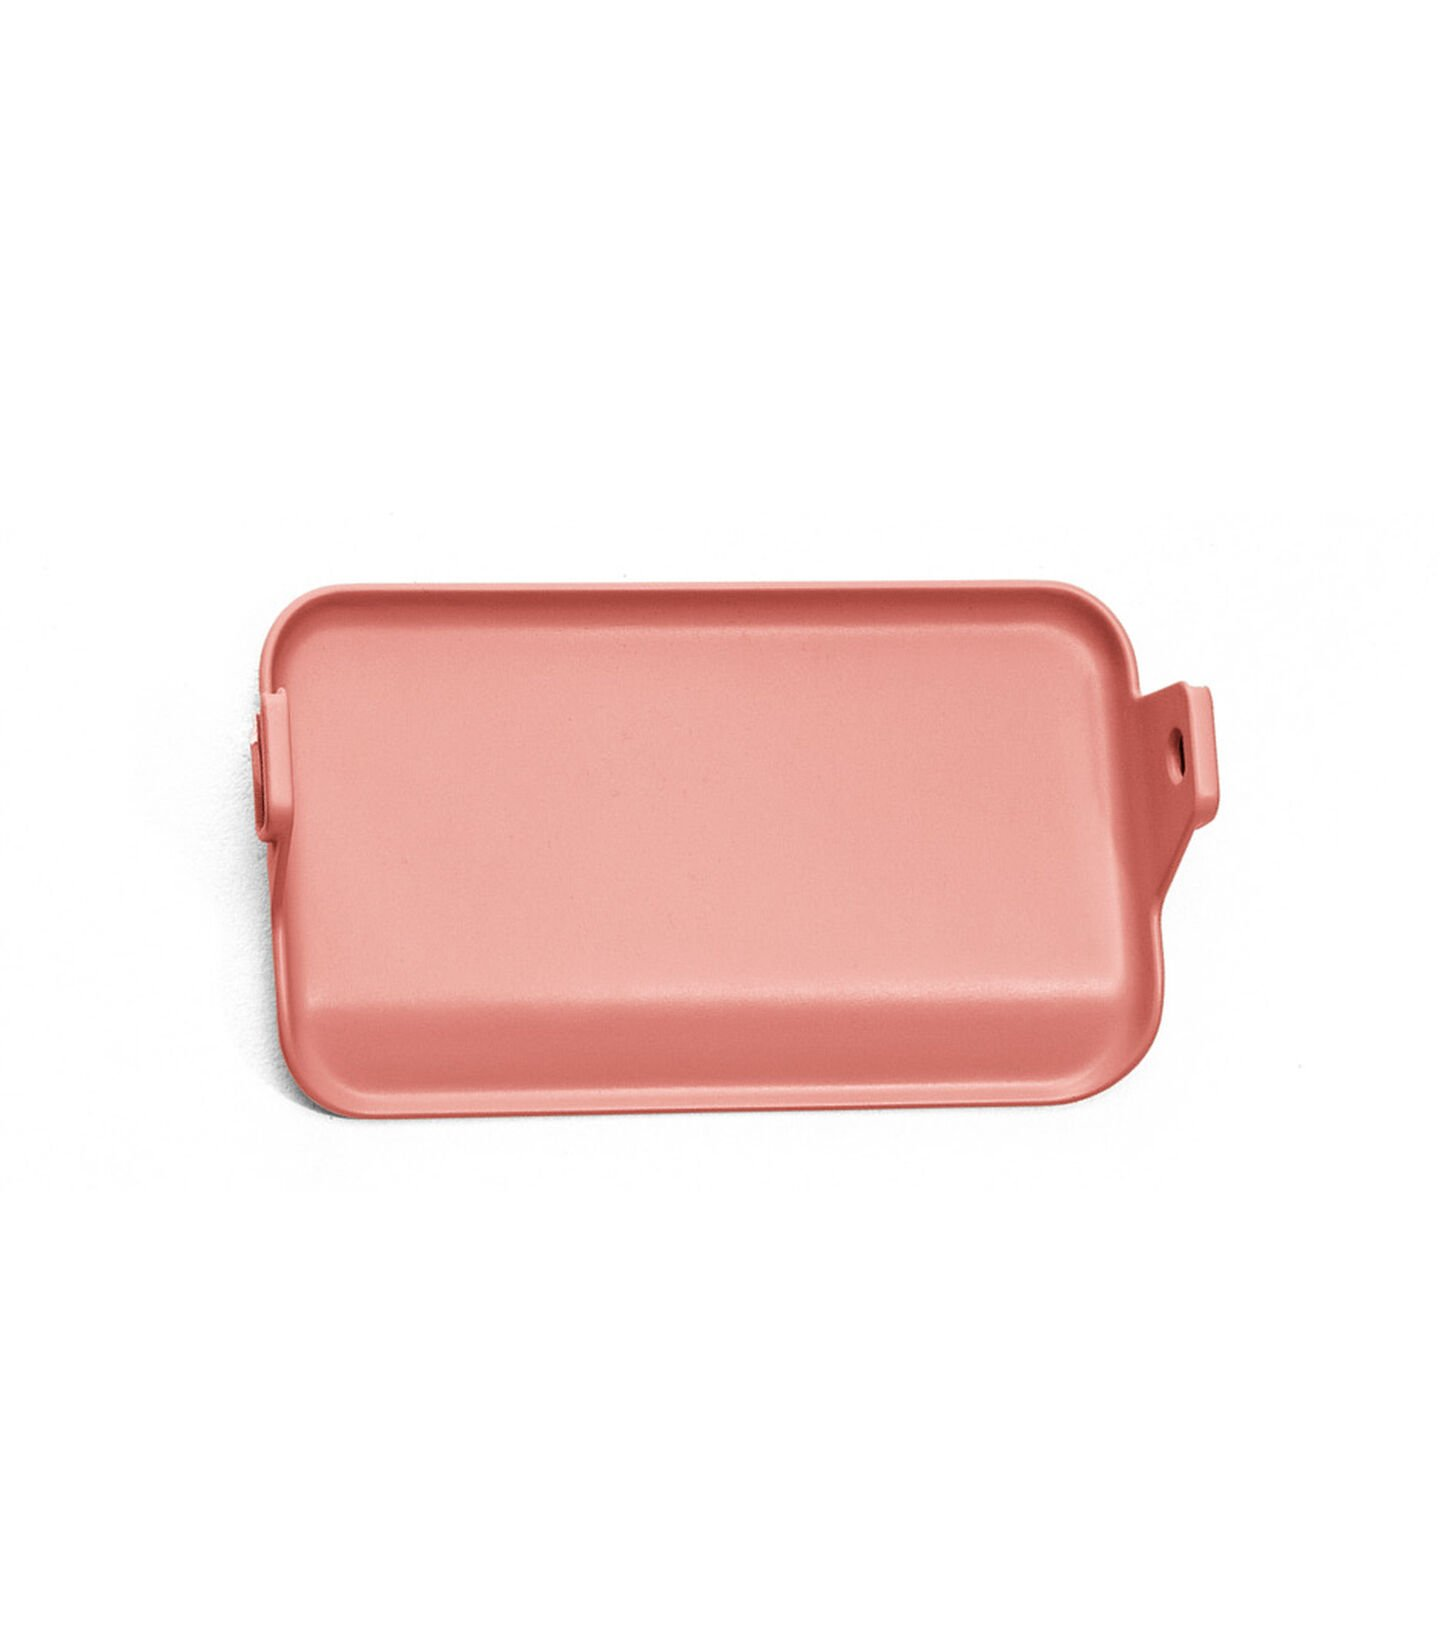 Reposapiés Stokke® Clikk™ Sunny Coral, Coral Brillante, mainview